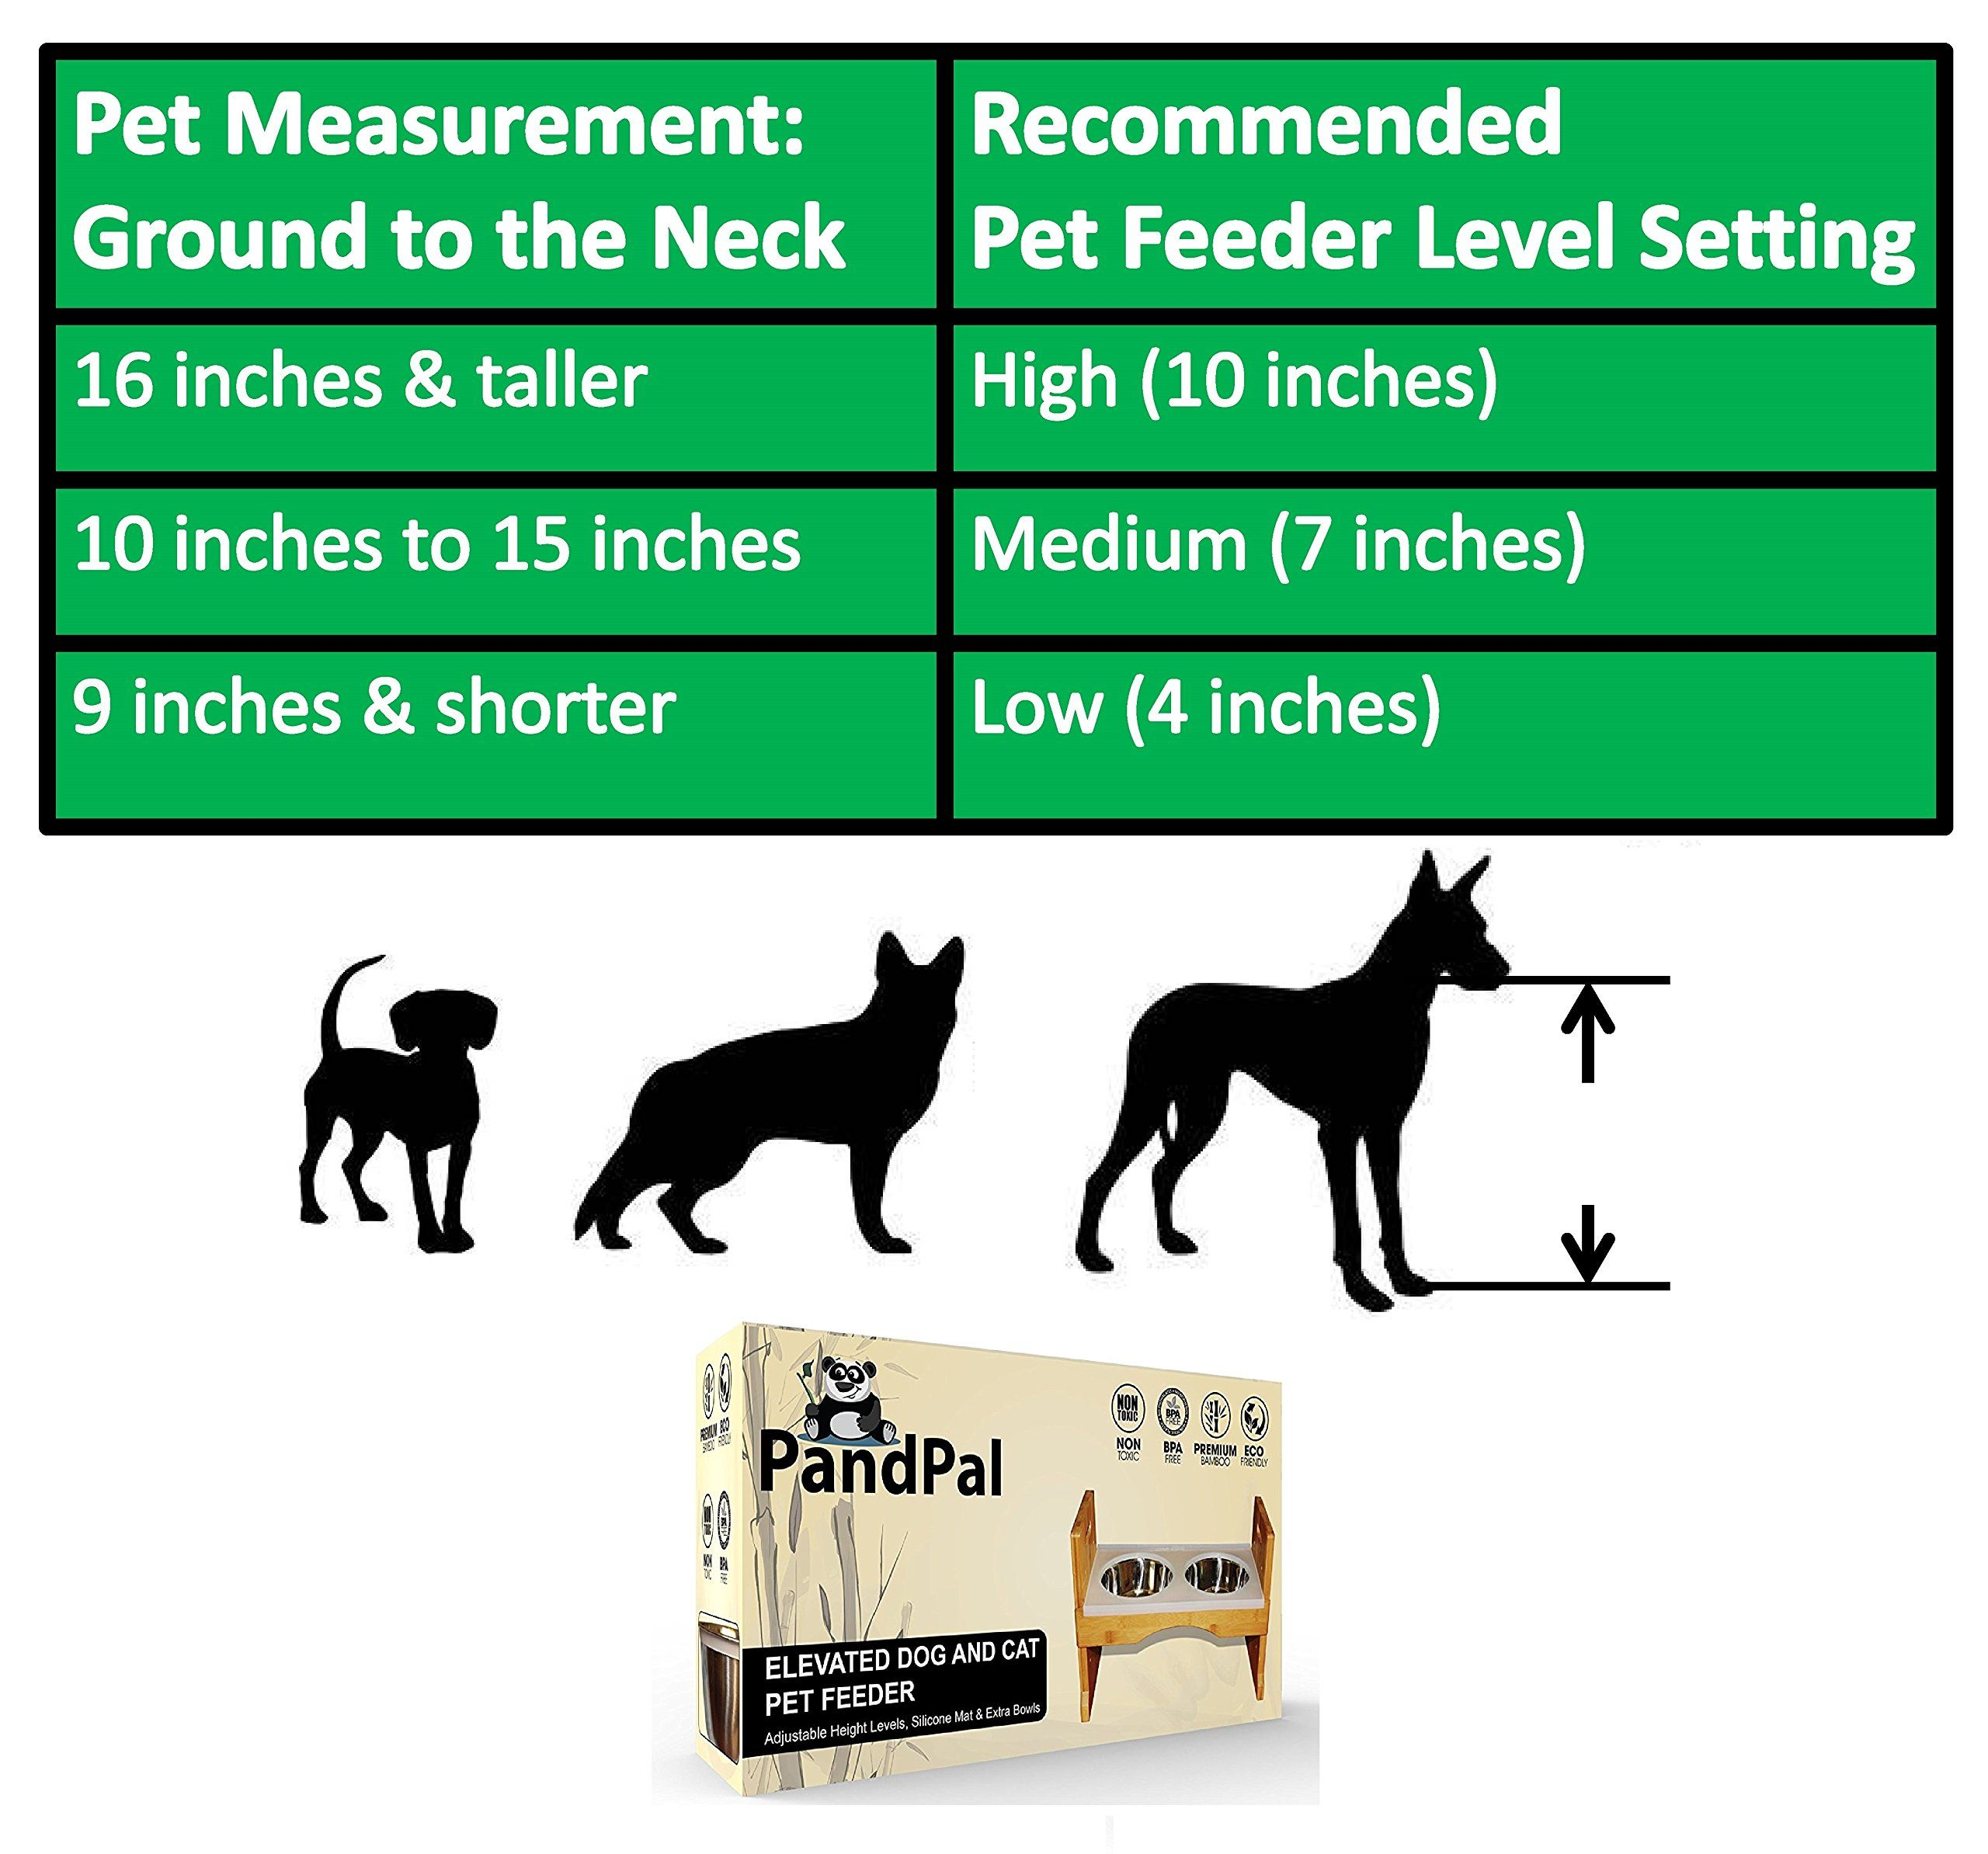 Adjustable Raised Pet Dog Feeder ?u20ac? Waterproof Design W/ Silicone Mat  #DogFeedingWateringSupplies